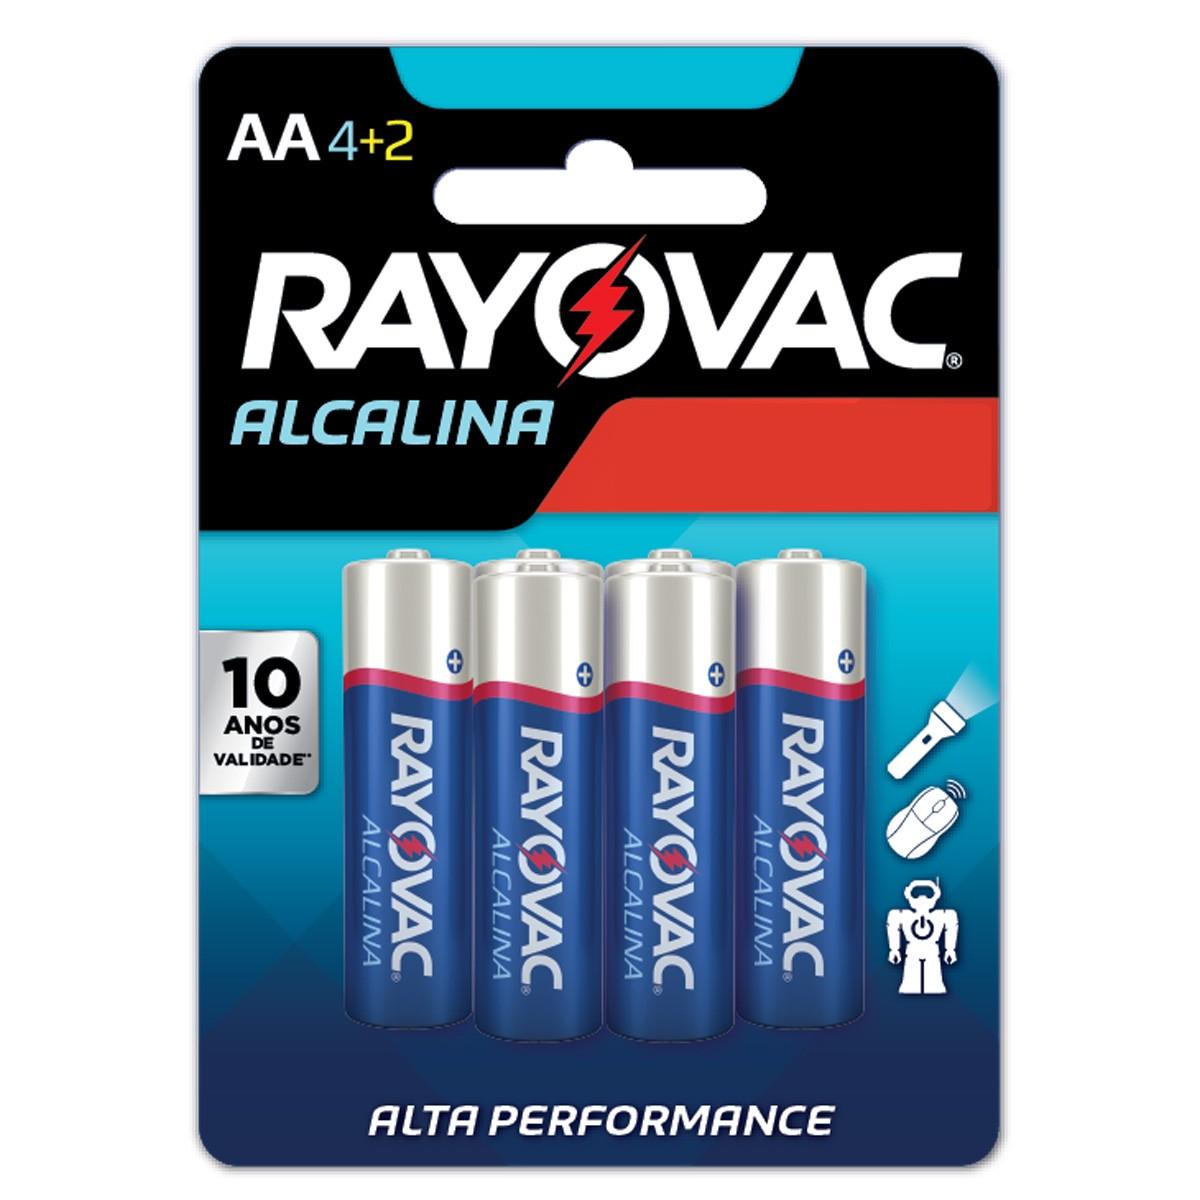 120 Pilhas AA Alcalina RAYOVAC 20 cartelas